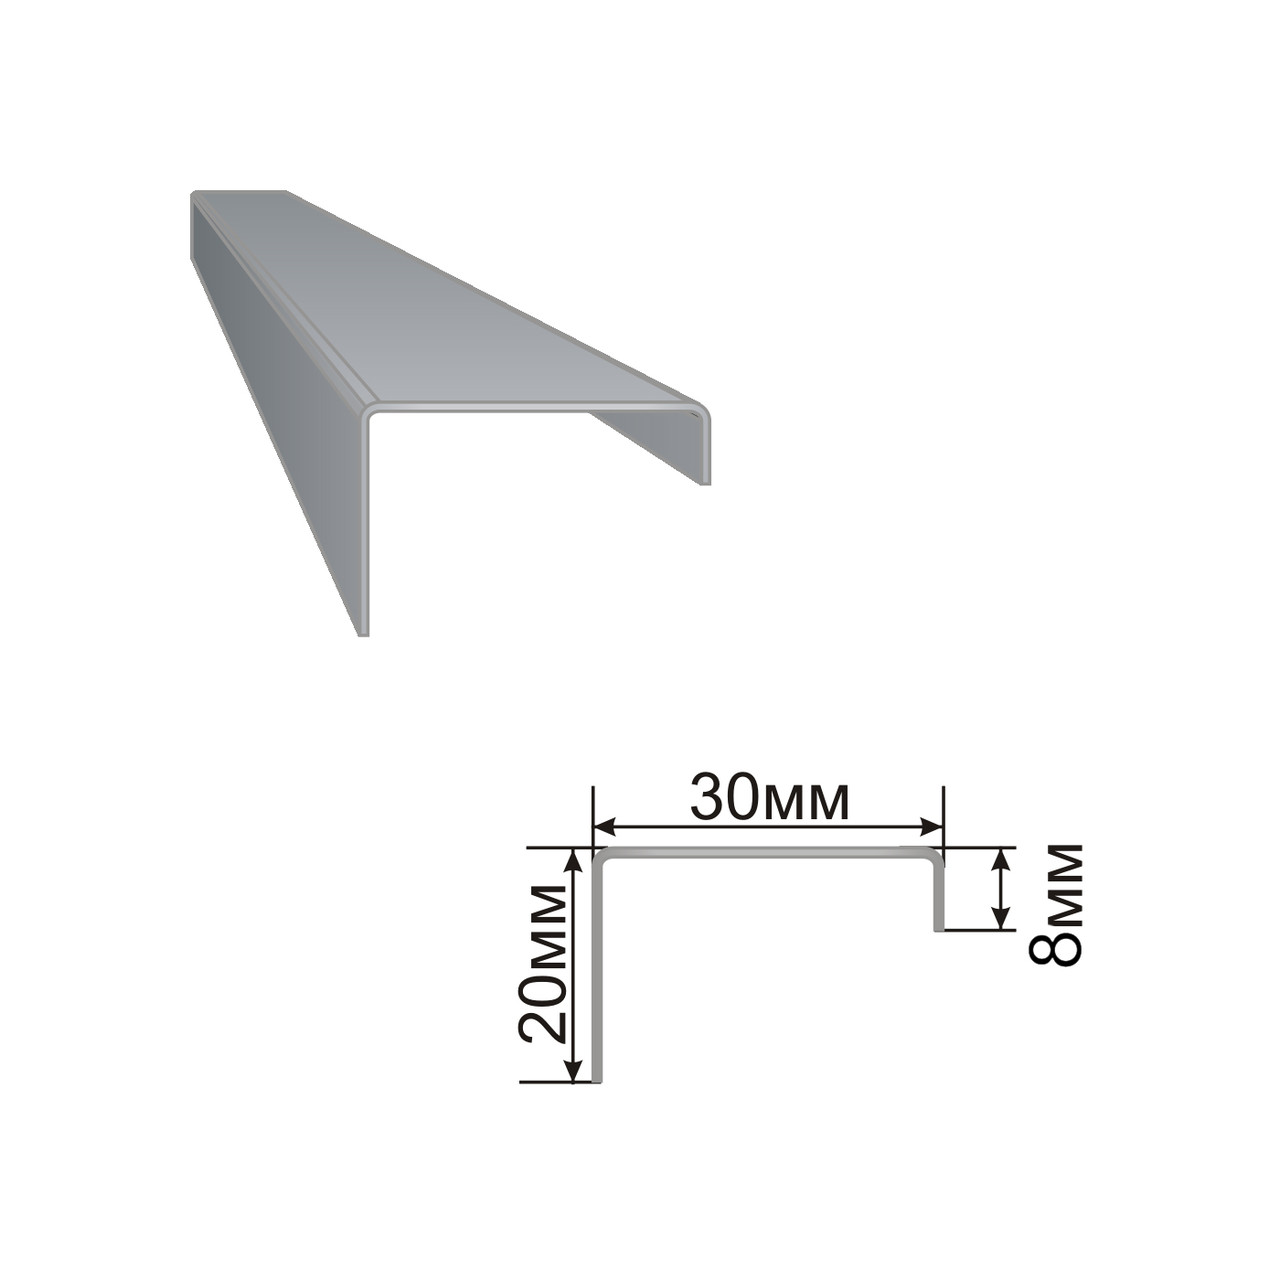 Армирующий профиль для окон ПВХ 8x30x20